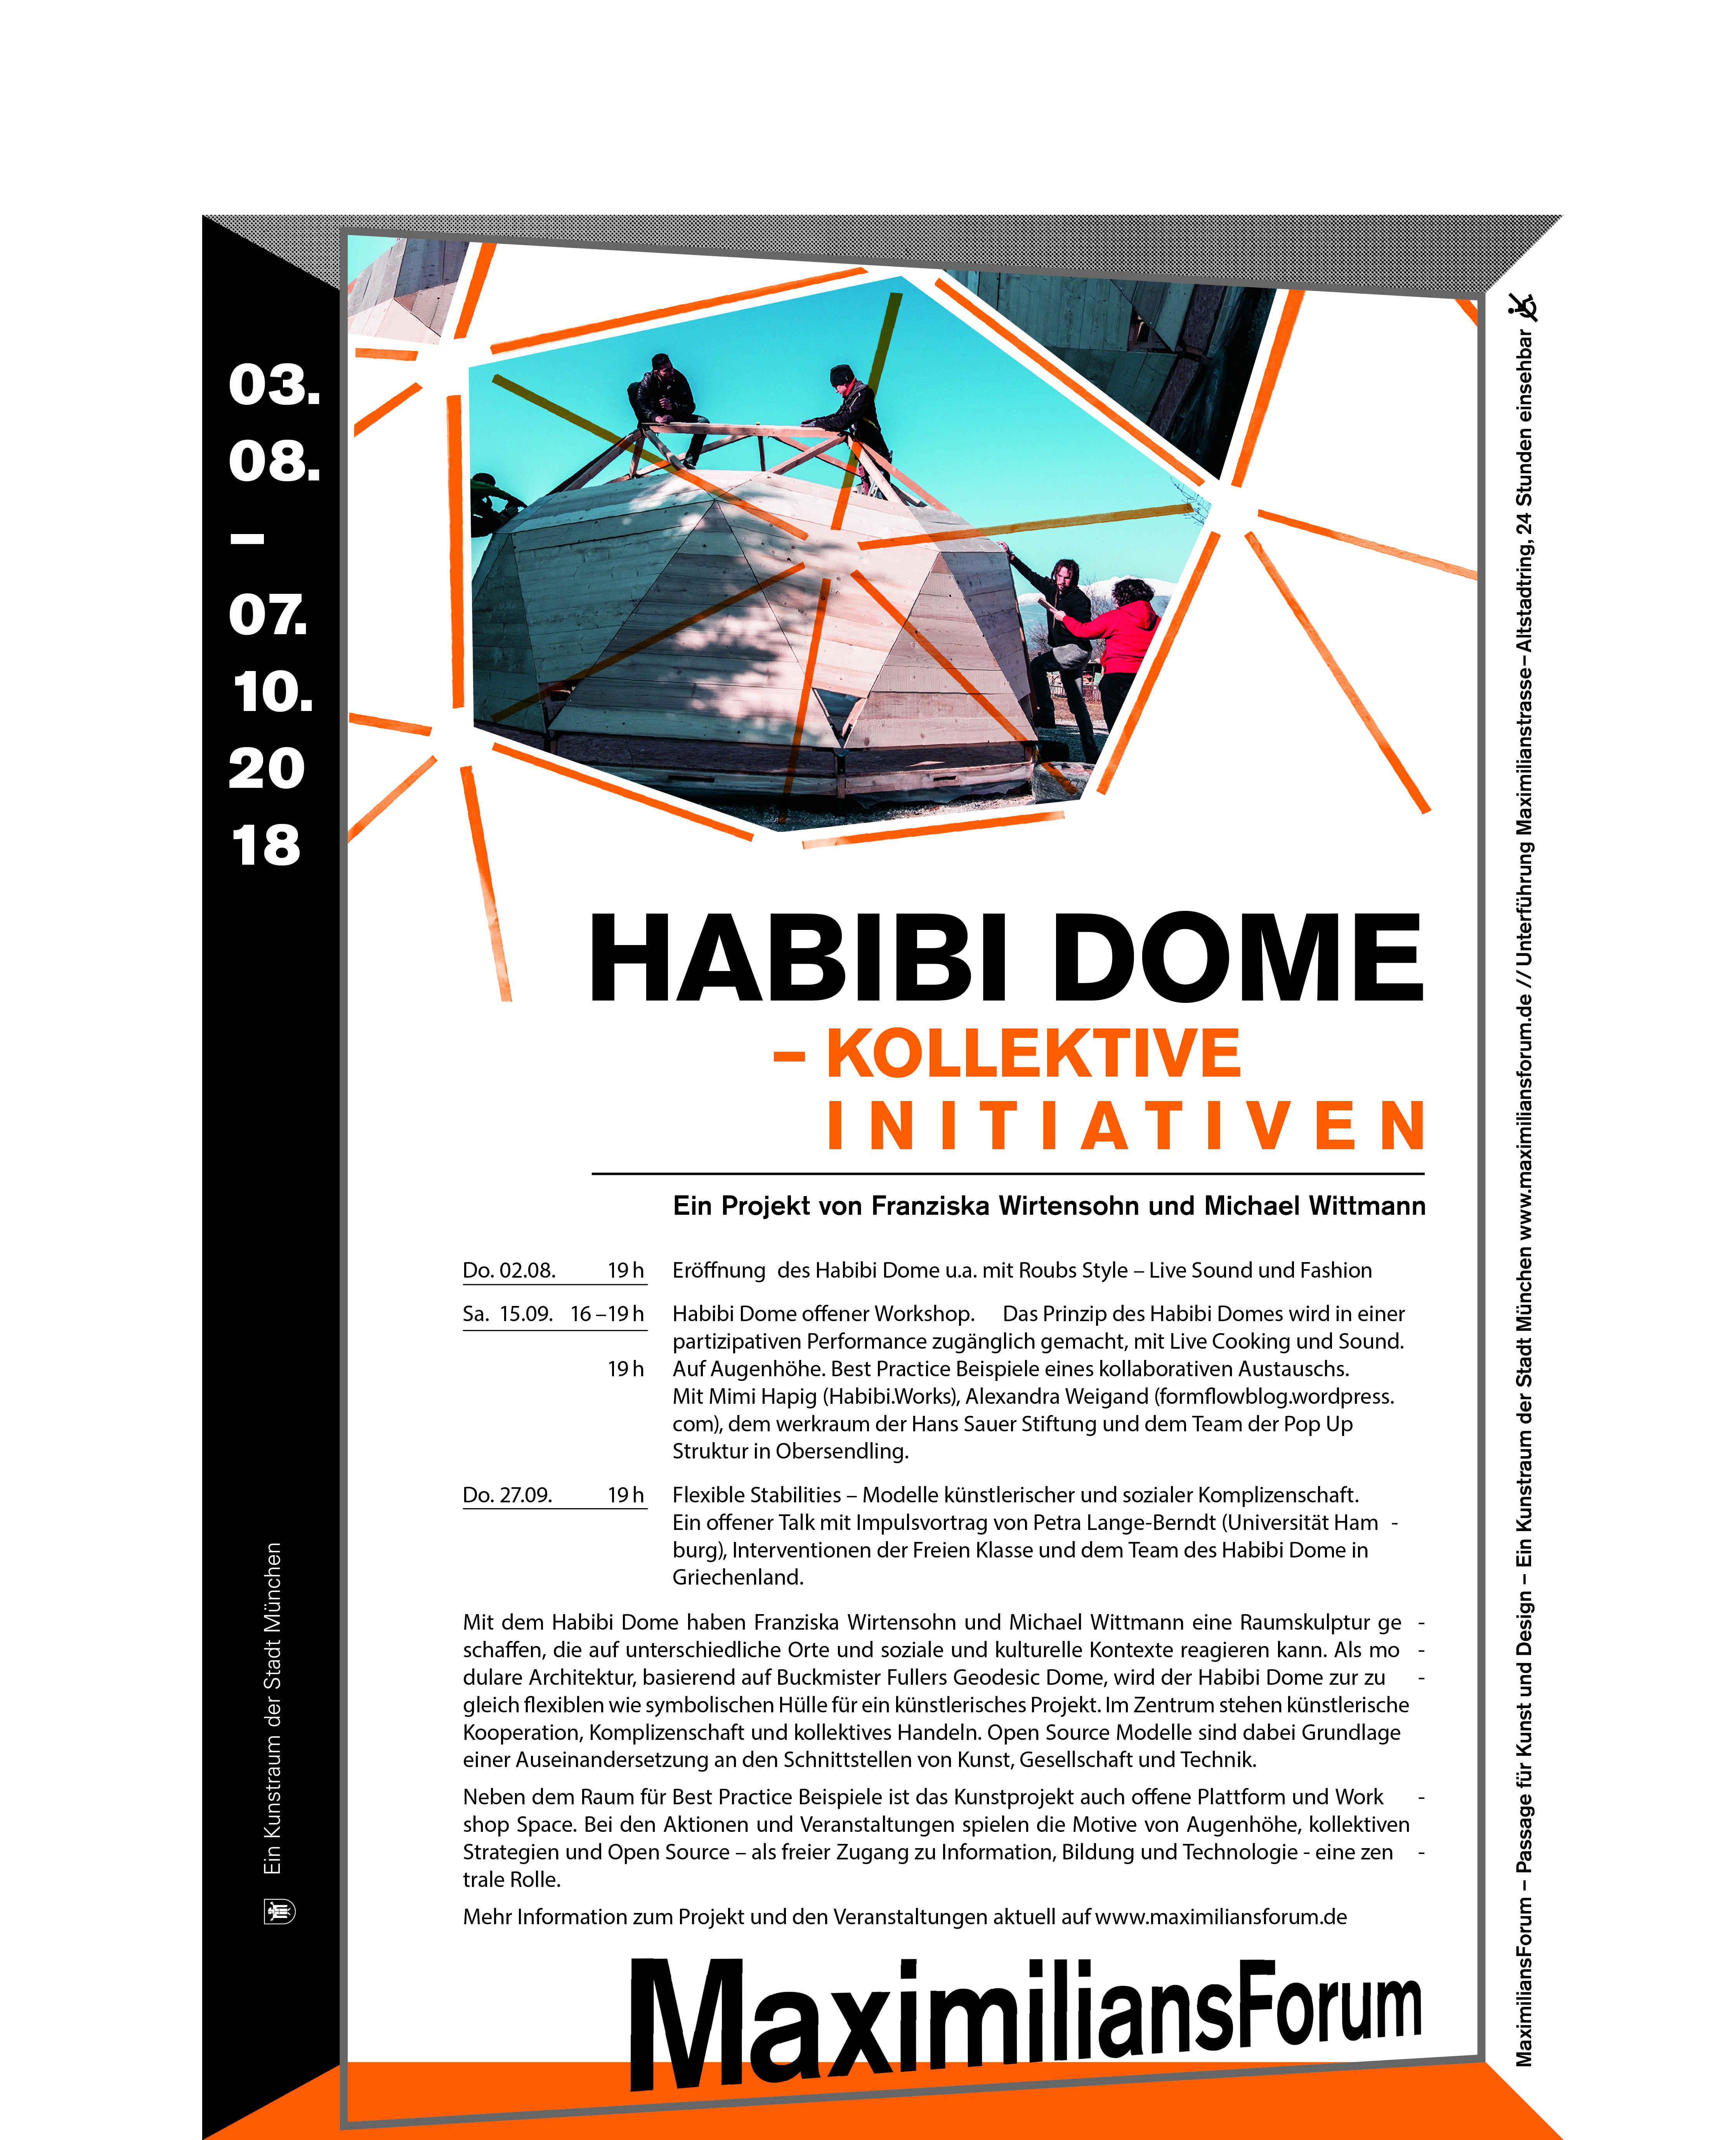 plakat_A3_Habibi Dome_1